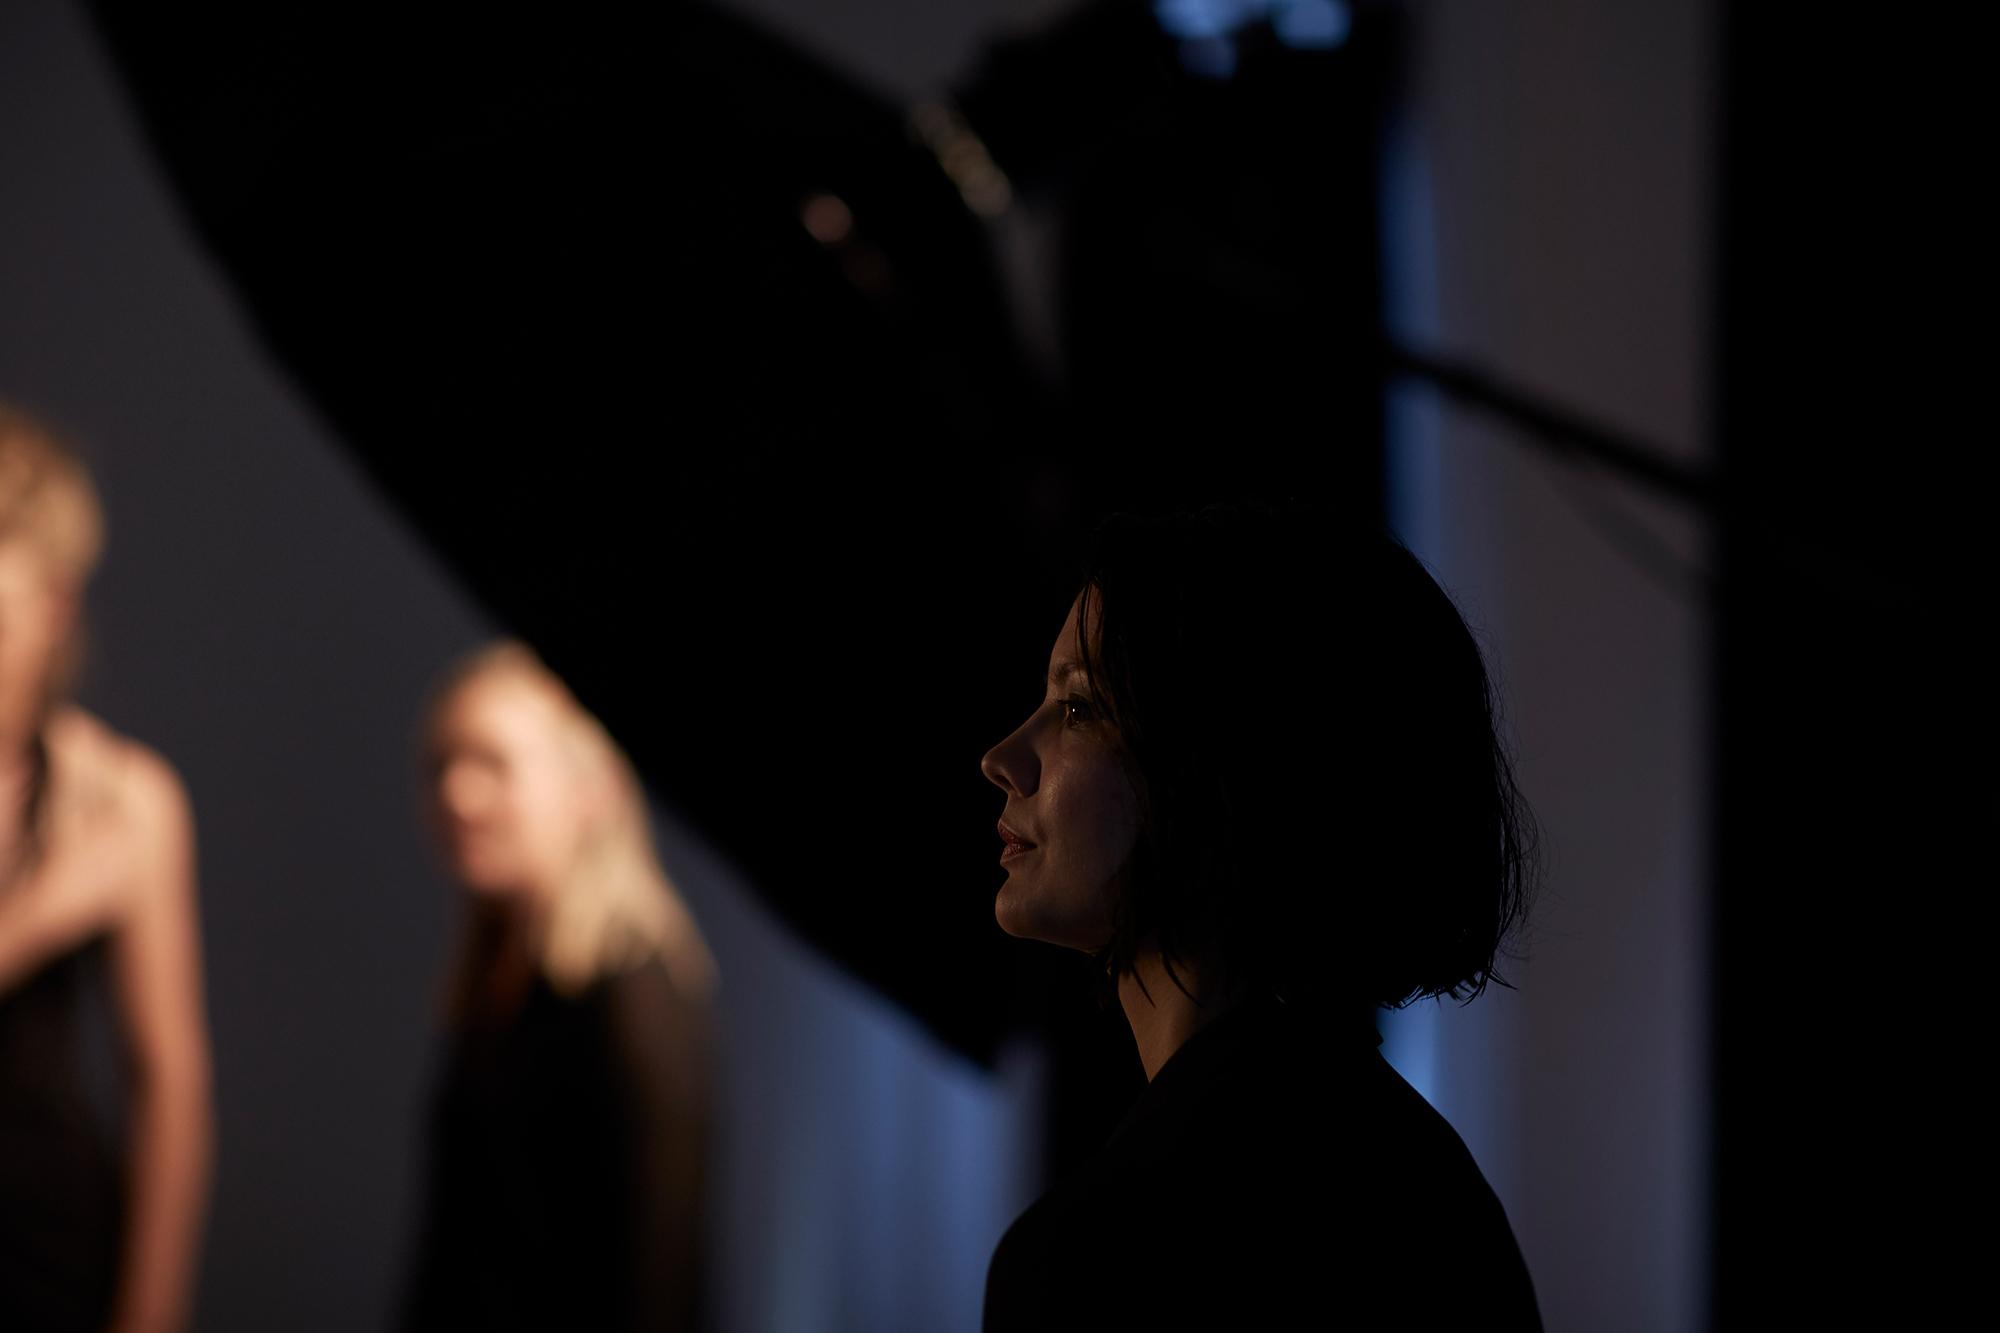 Intrusion 02 / photograph: Clare Plueckhahn